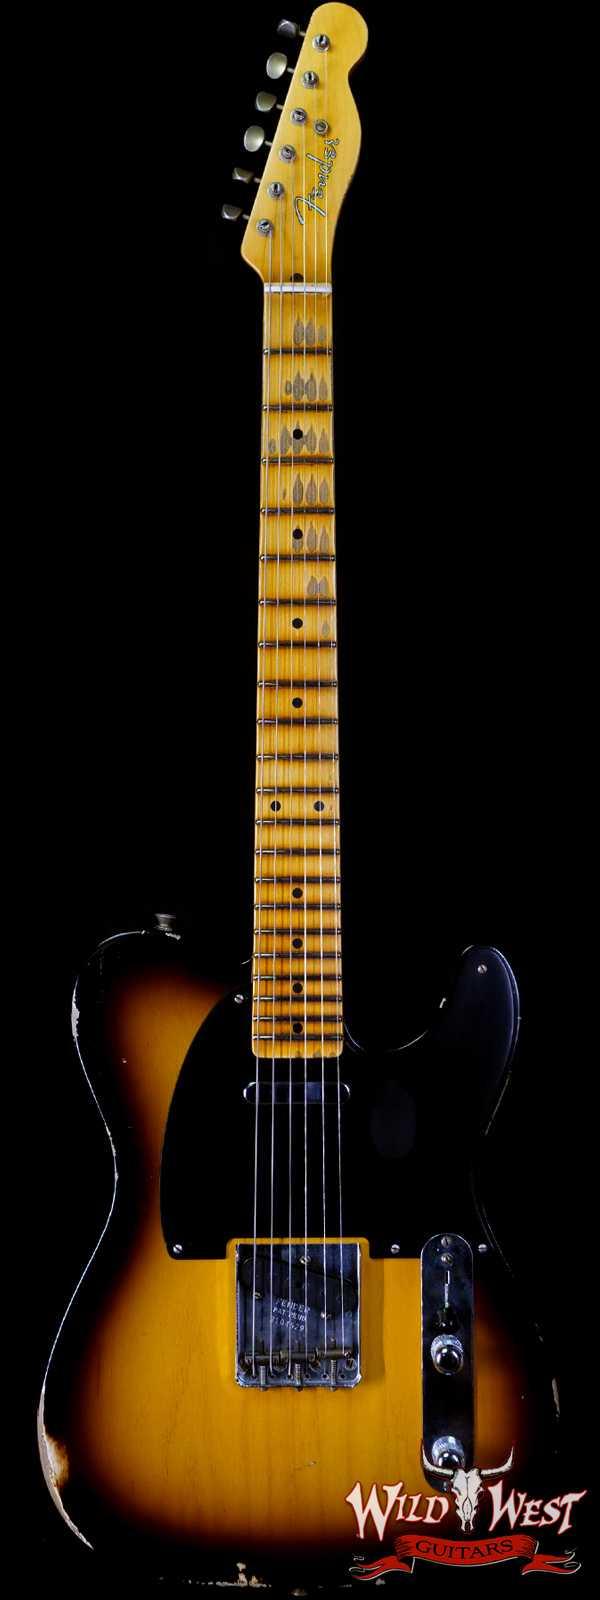 Fender Custom Shop 1951 Telecaster Relic Maple Neck 2 Tone Sunburst 7.15 LBS